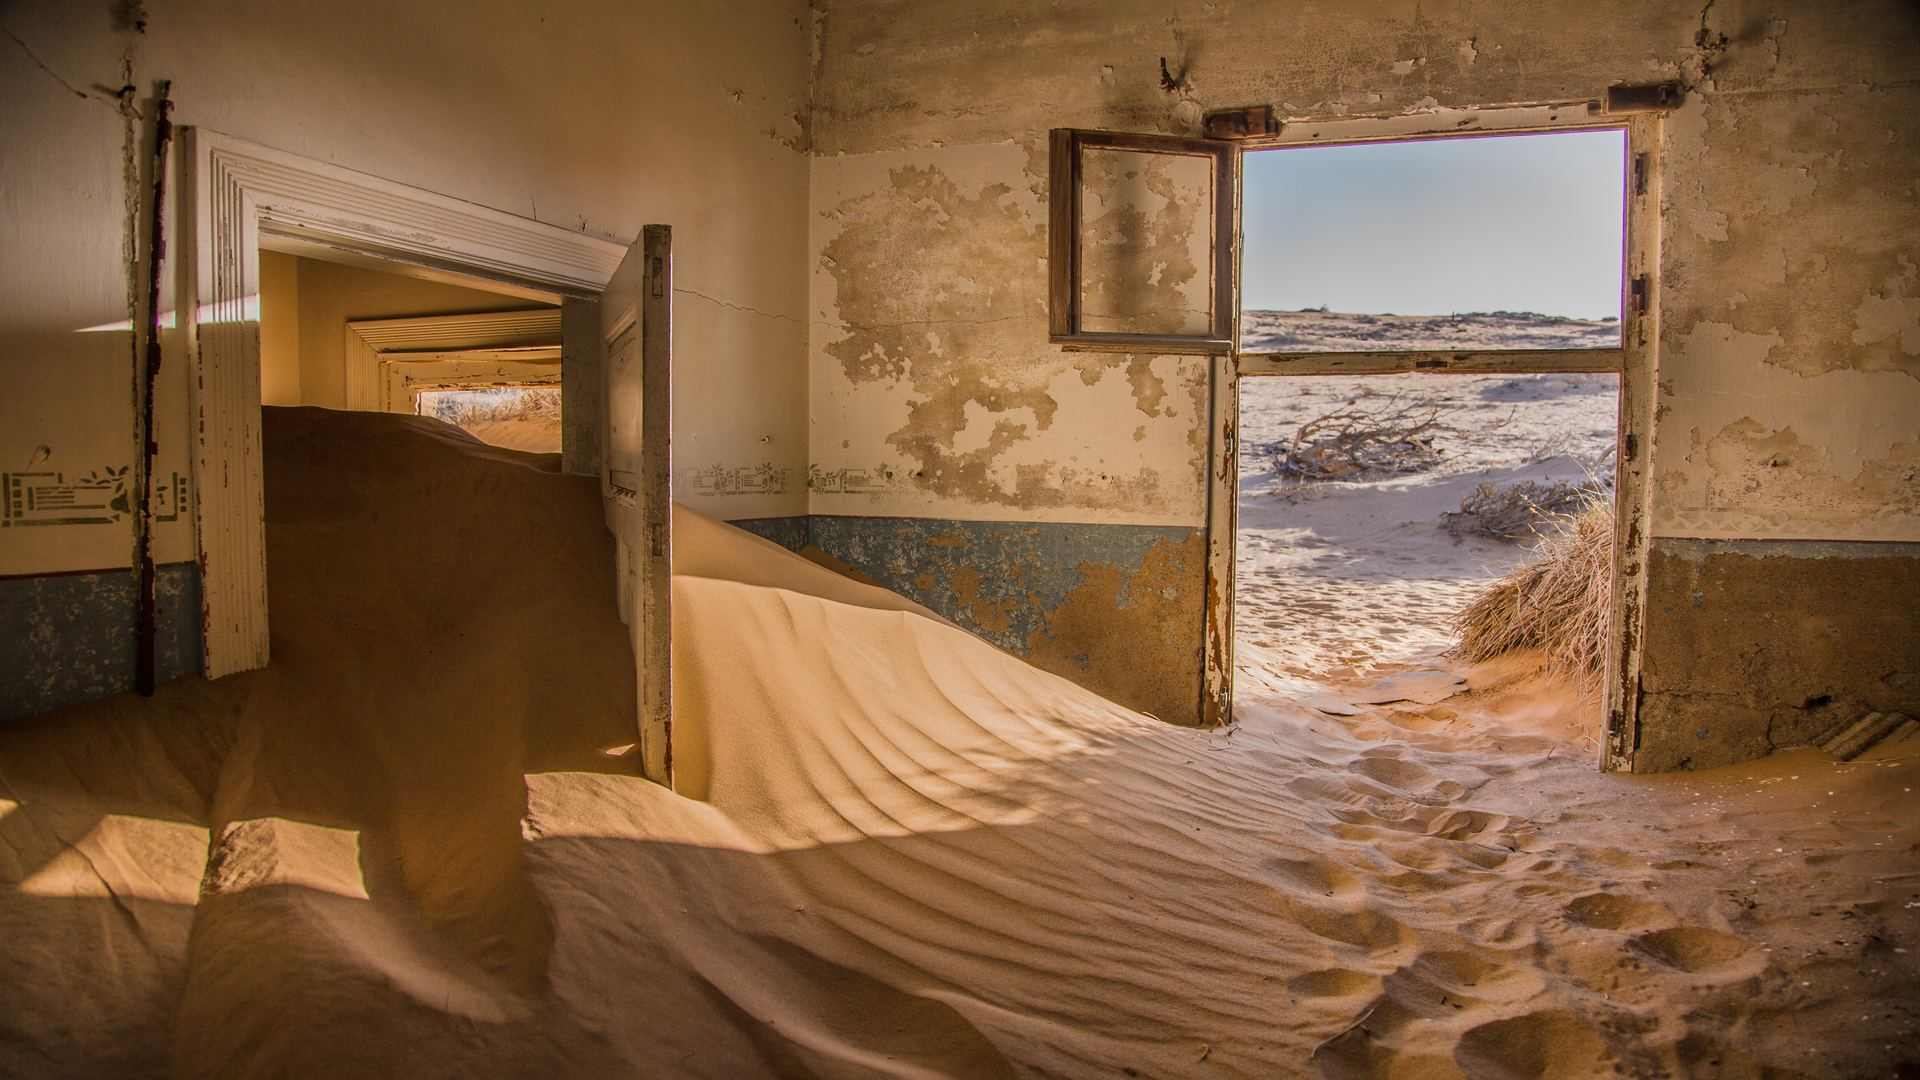 General 1920x1080 sand desert house Namibia abandoned ruin indoors dust brown door sunlight